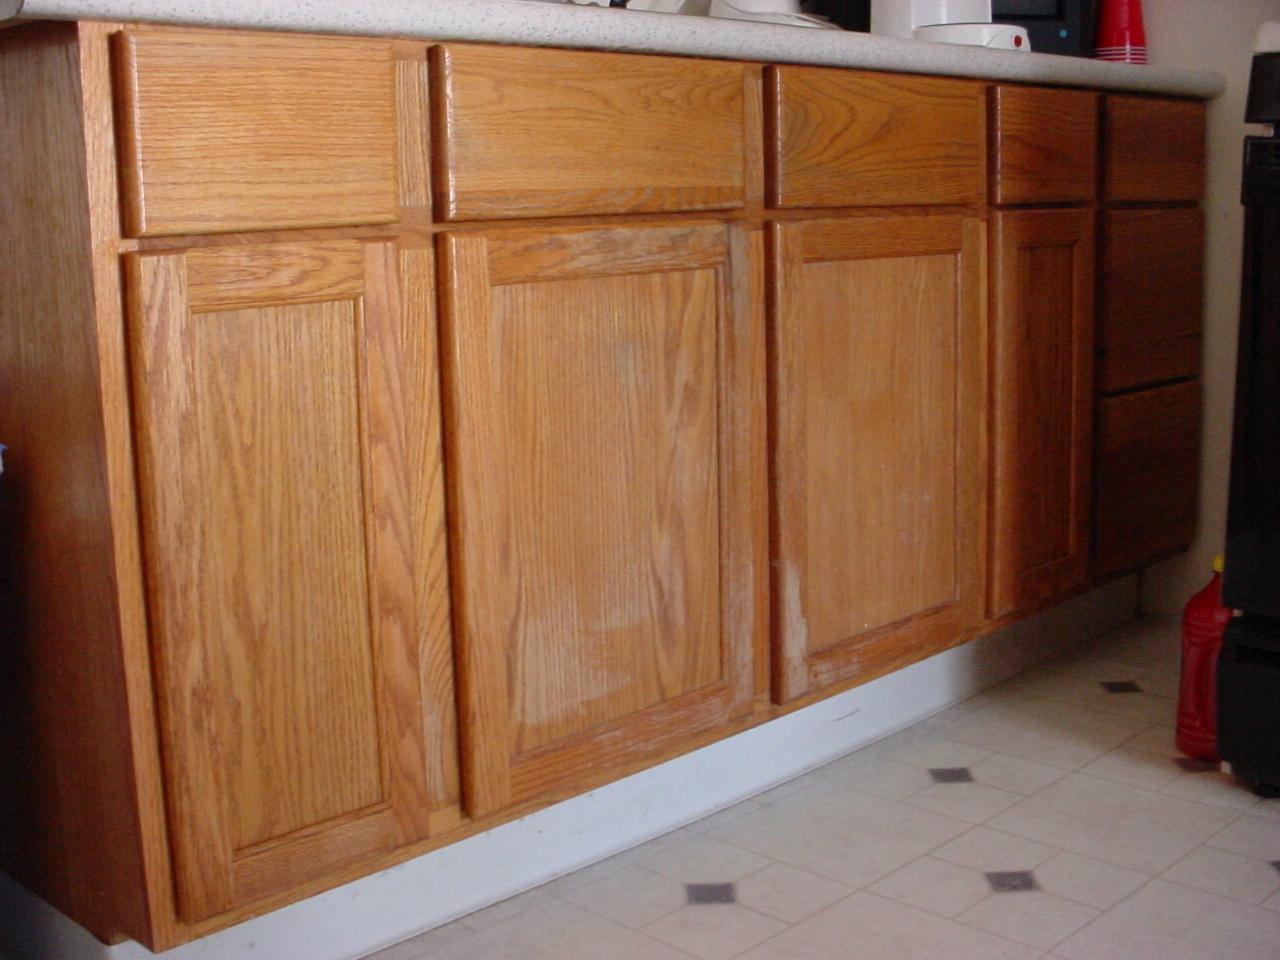 justlikenewcabinets wordpress staining kitchen cabinets Cabinets